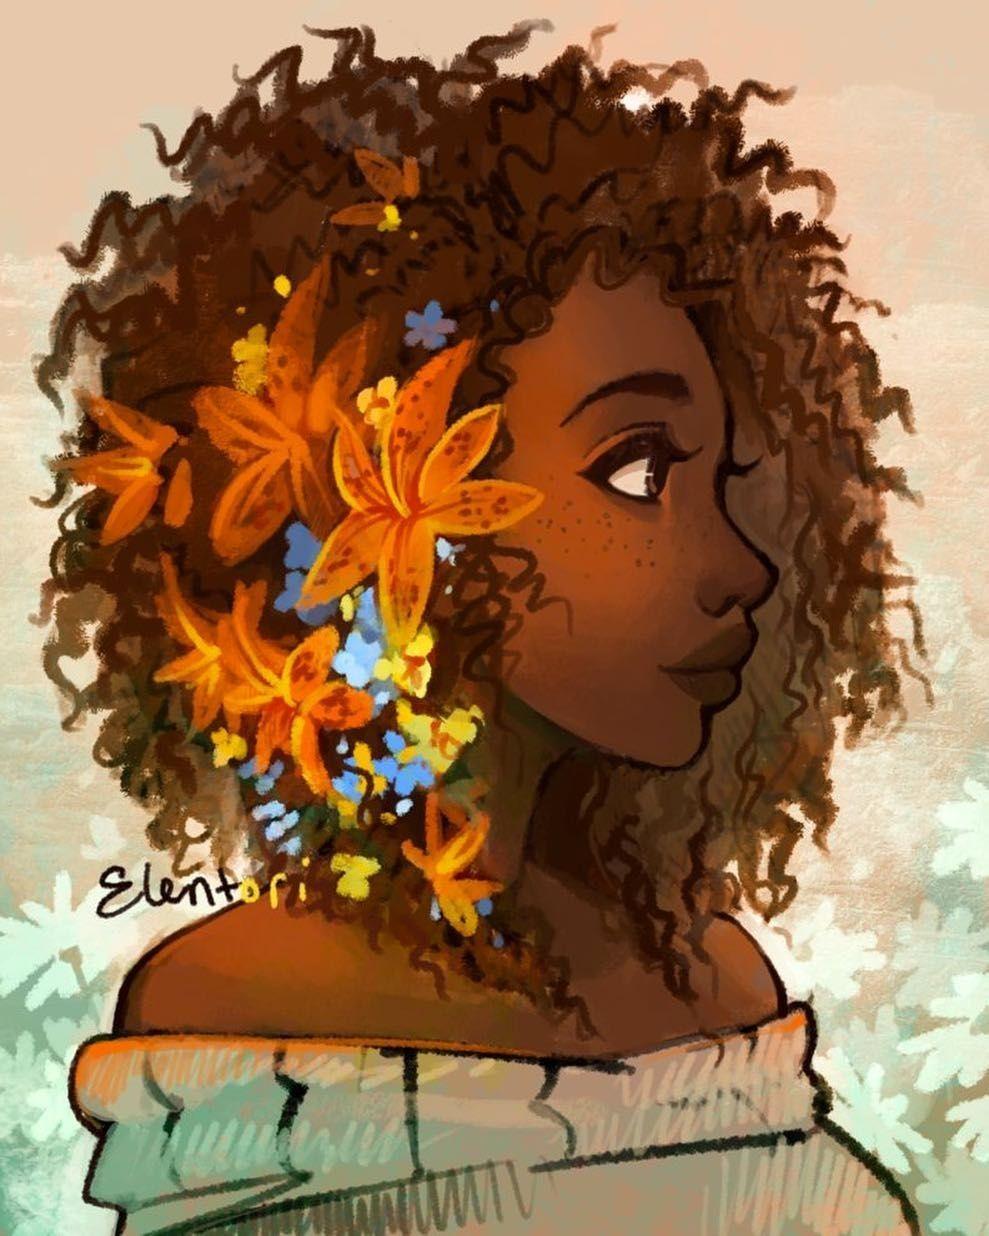 Hair and flowers in Faces u Fotos Pinterest Art Drawings